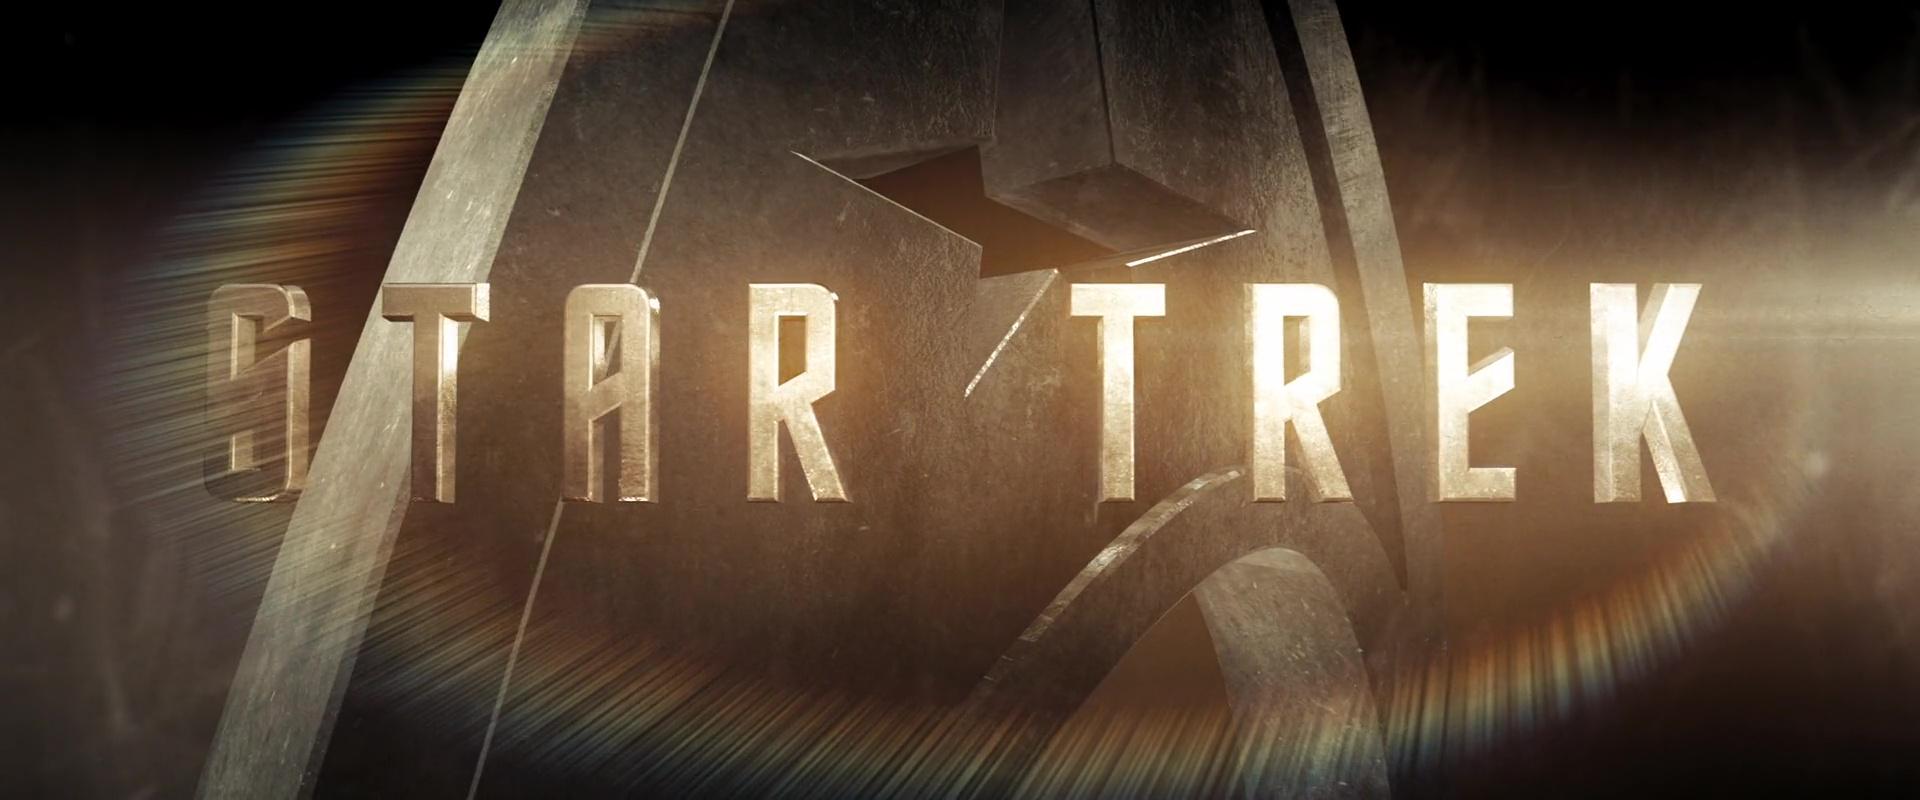 STAR TREK de J.J. Abrams (2009)